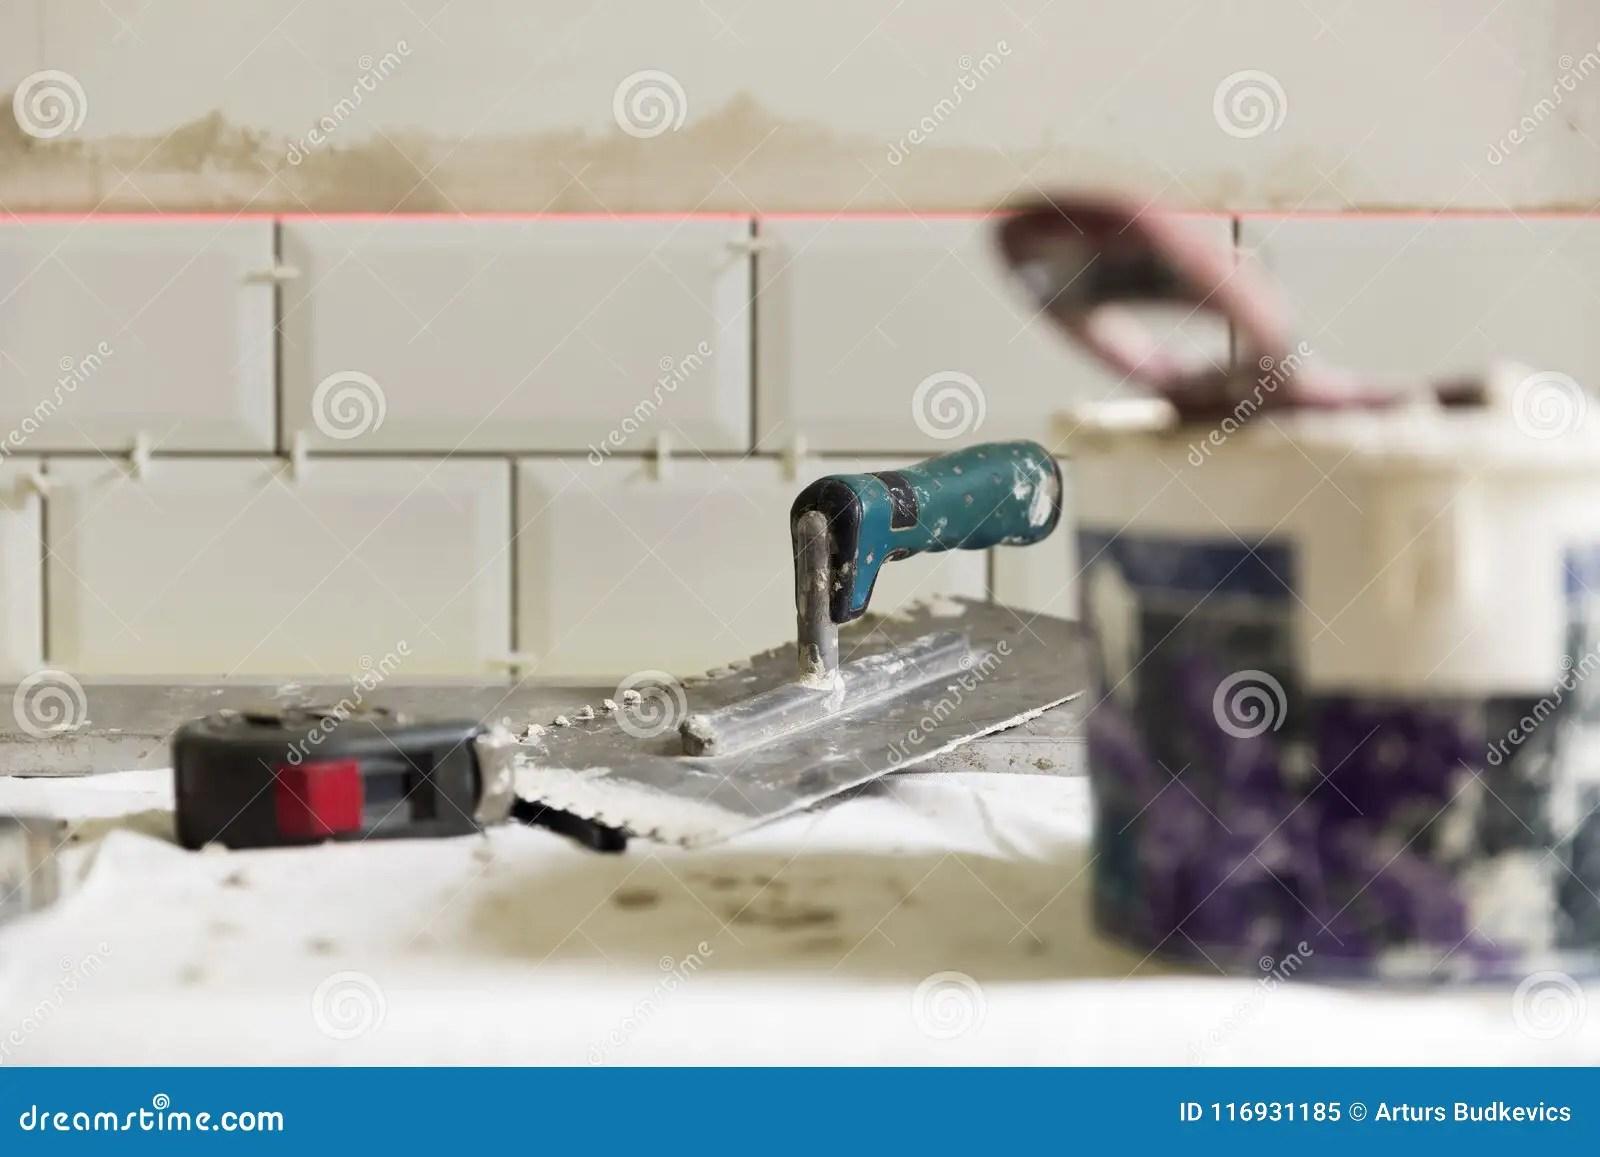 cement tile kitchen booster seat 铺磁砖瓦片的过程在有必要的盖瓦的厨房里库存图片 图片包括有水泥 泥工 铺磁砖瓦片的过程在有必要的盖瓦工具的厨房里住所改善 整修概念